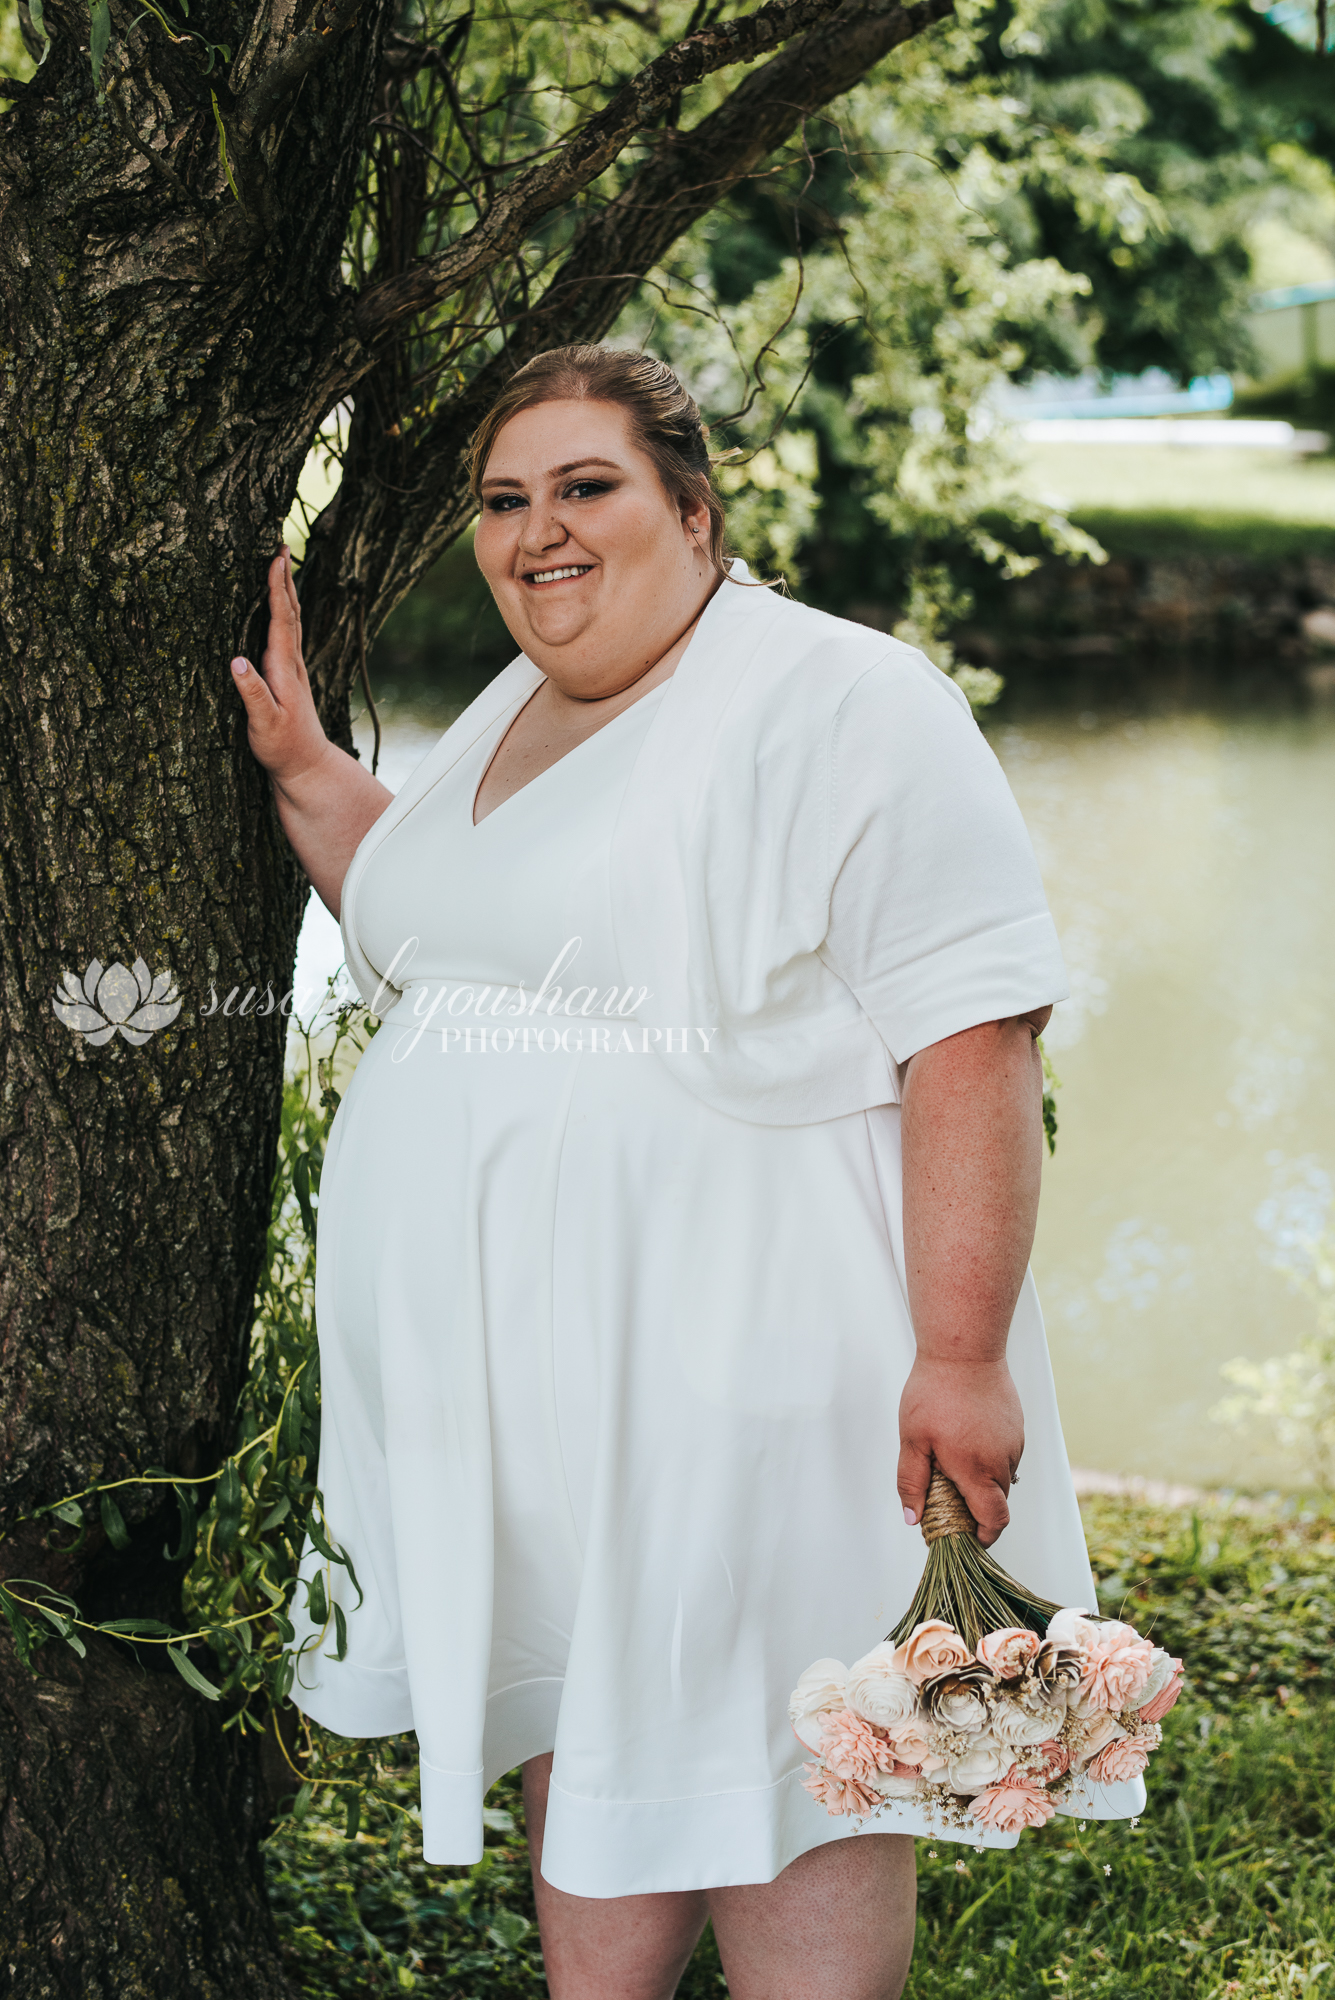 Bill and Sarah Wedding Photos 06-08-2019 SLY Photography -39.jpg